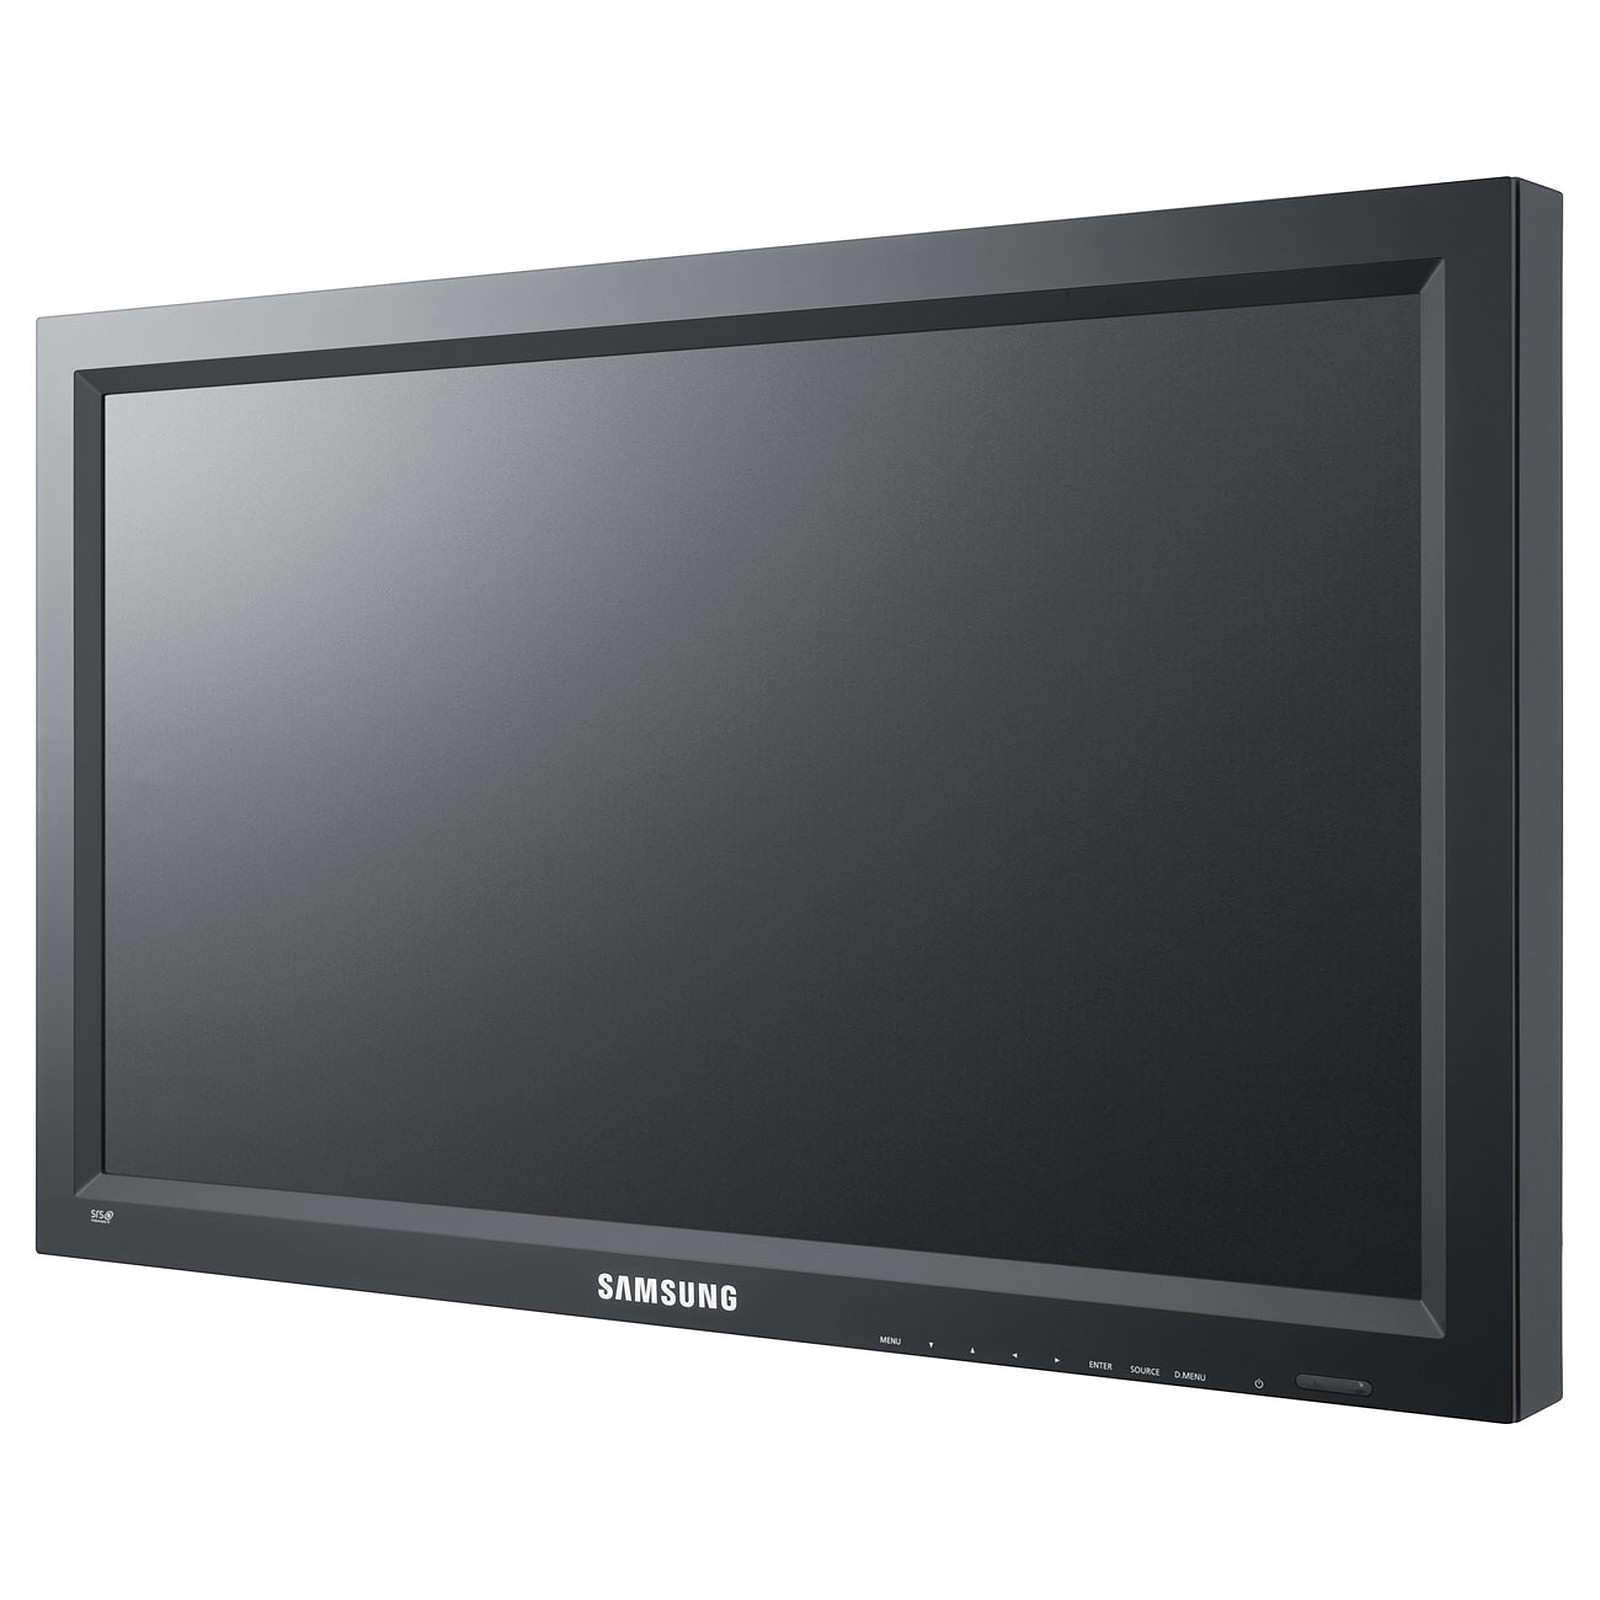 "Samsung 32"" LCD 320MX-3"